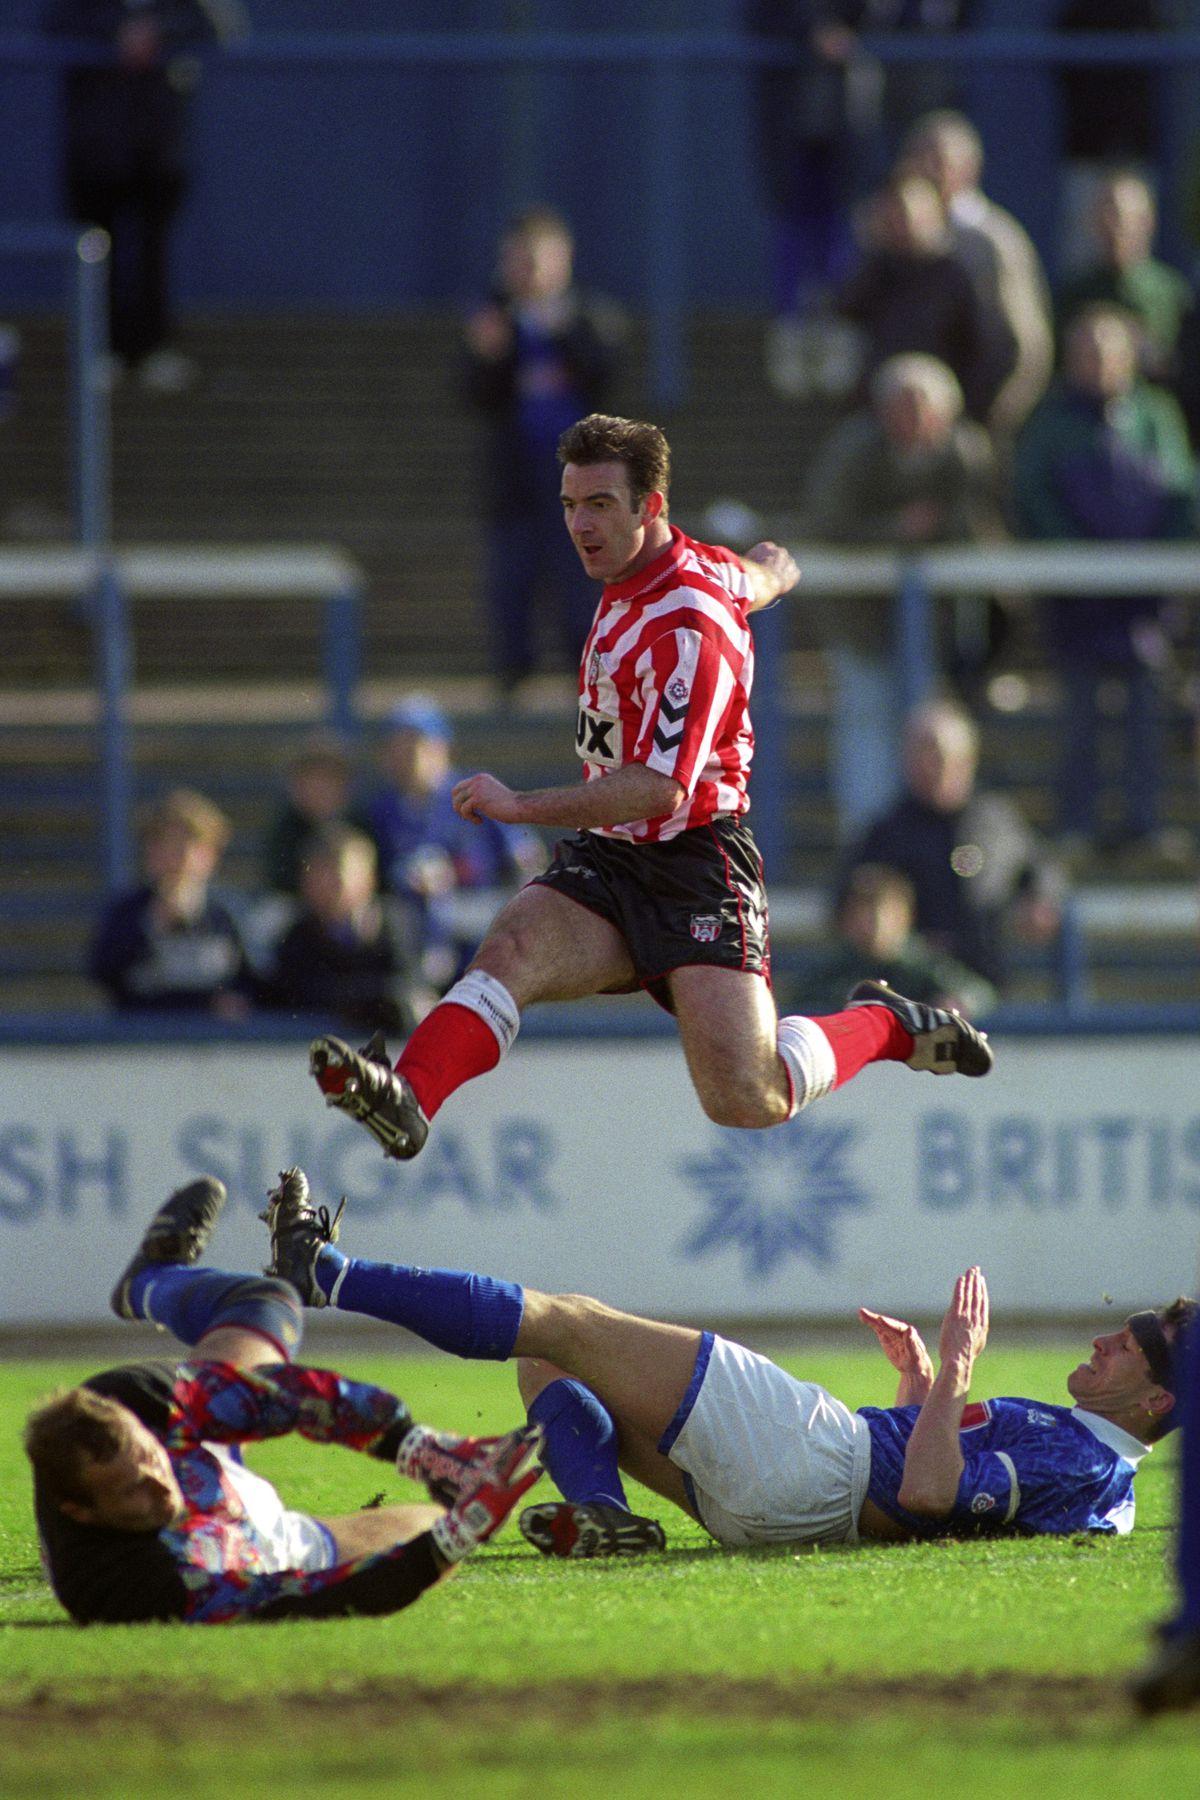 Soccer - Endsleigh League Division One - Peterborough United v Sunderland - London Road